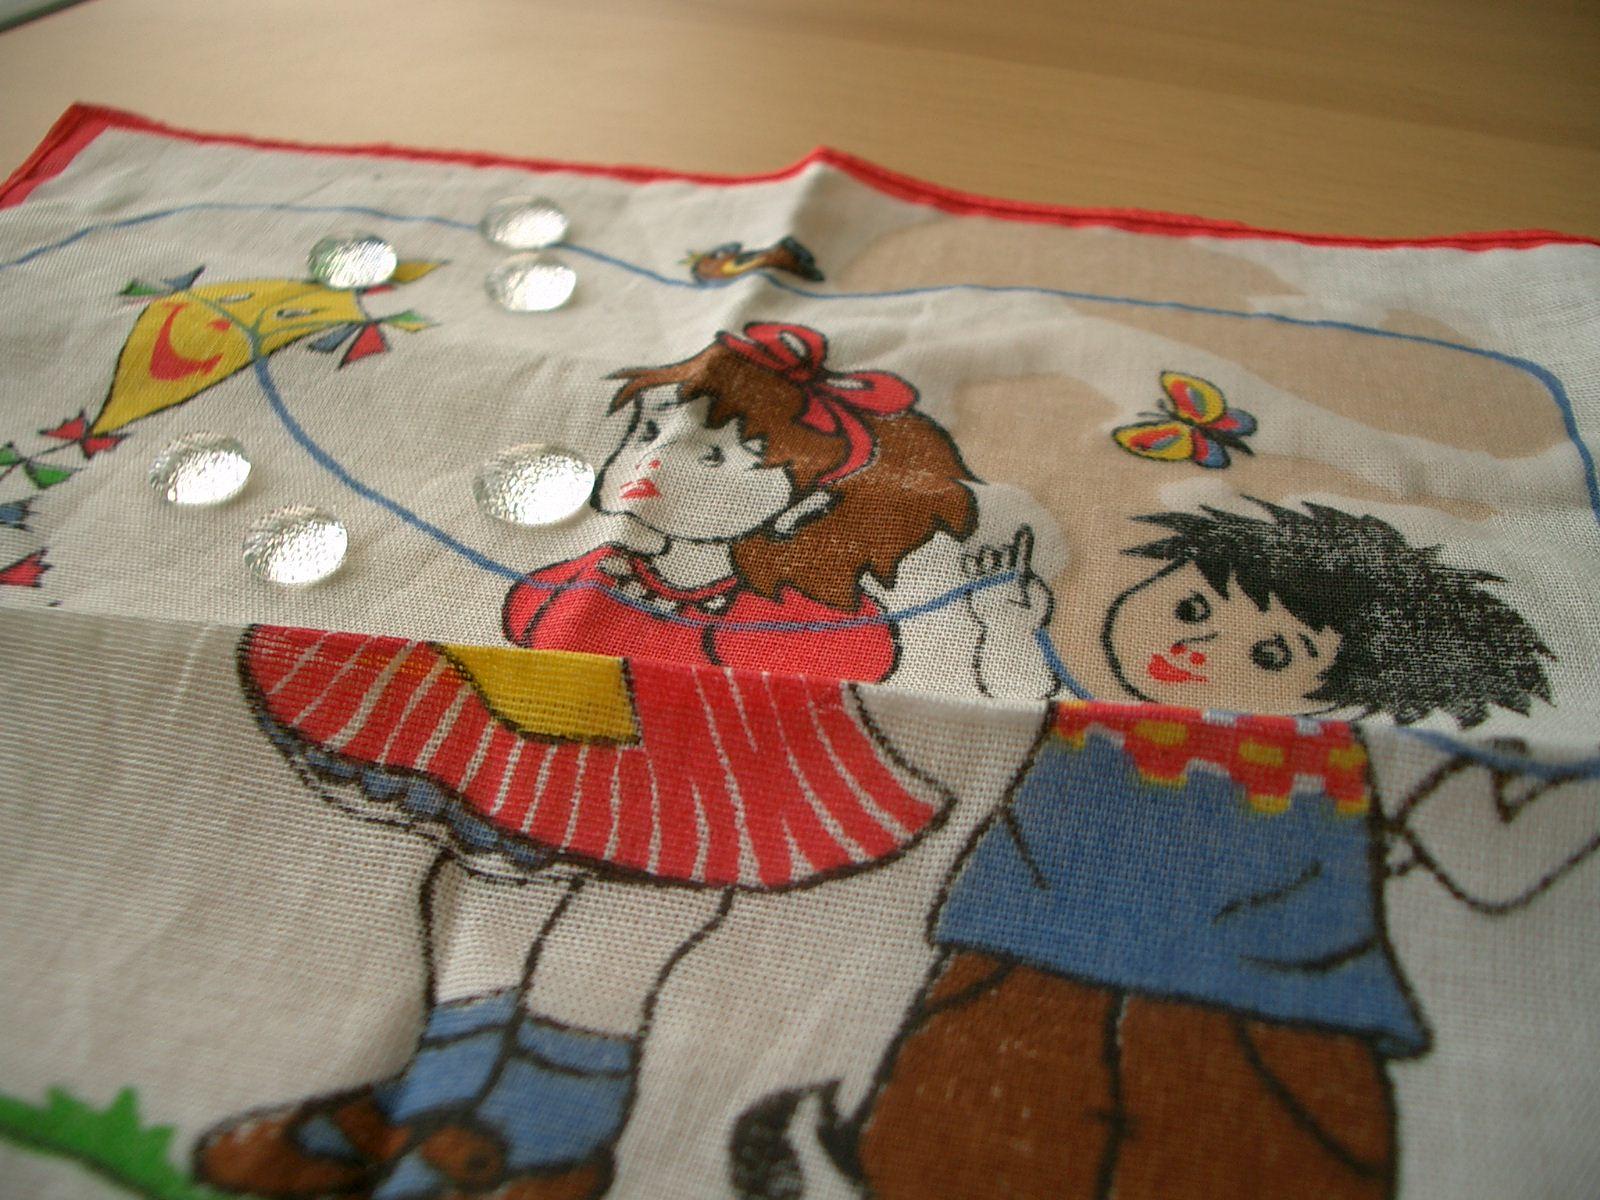 Nano ochrana textil